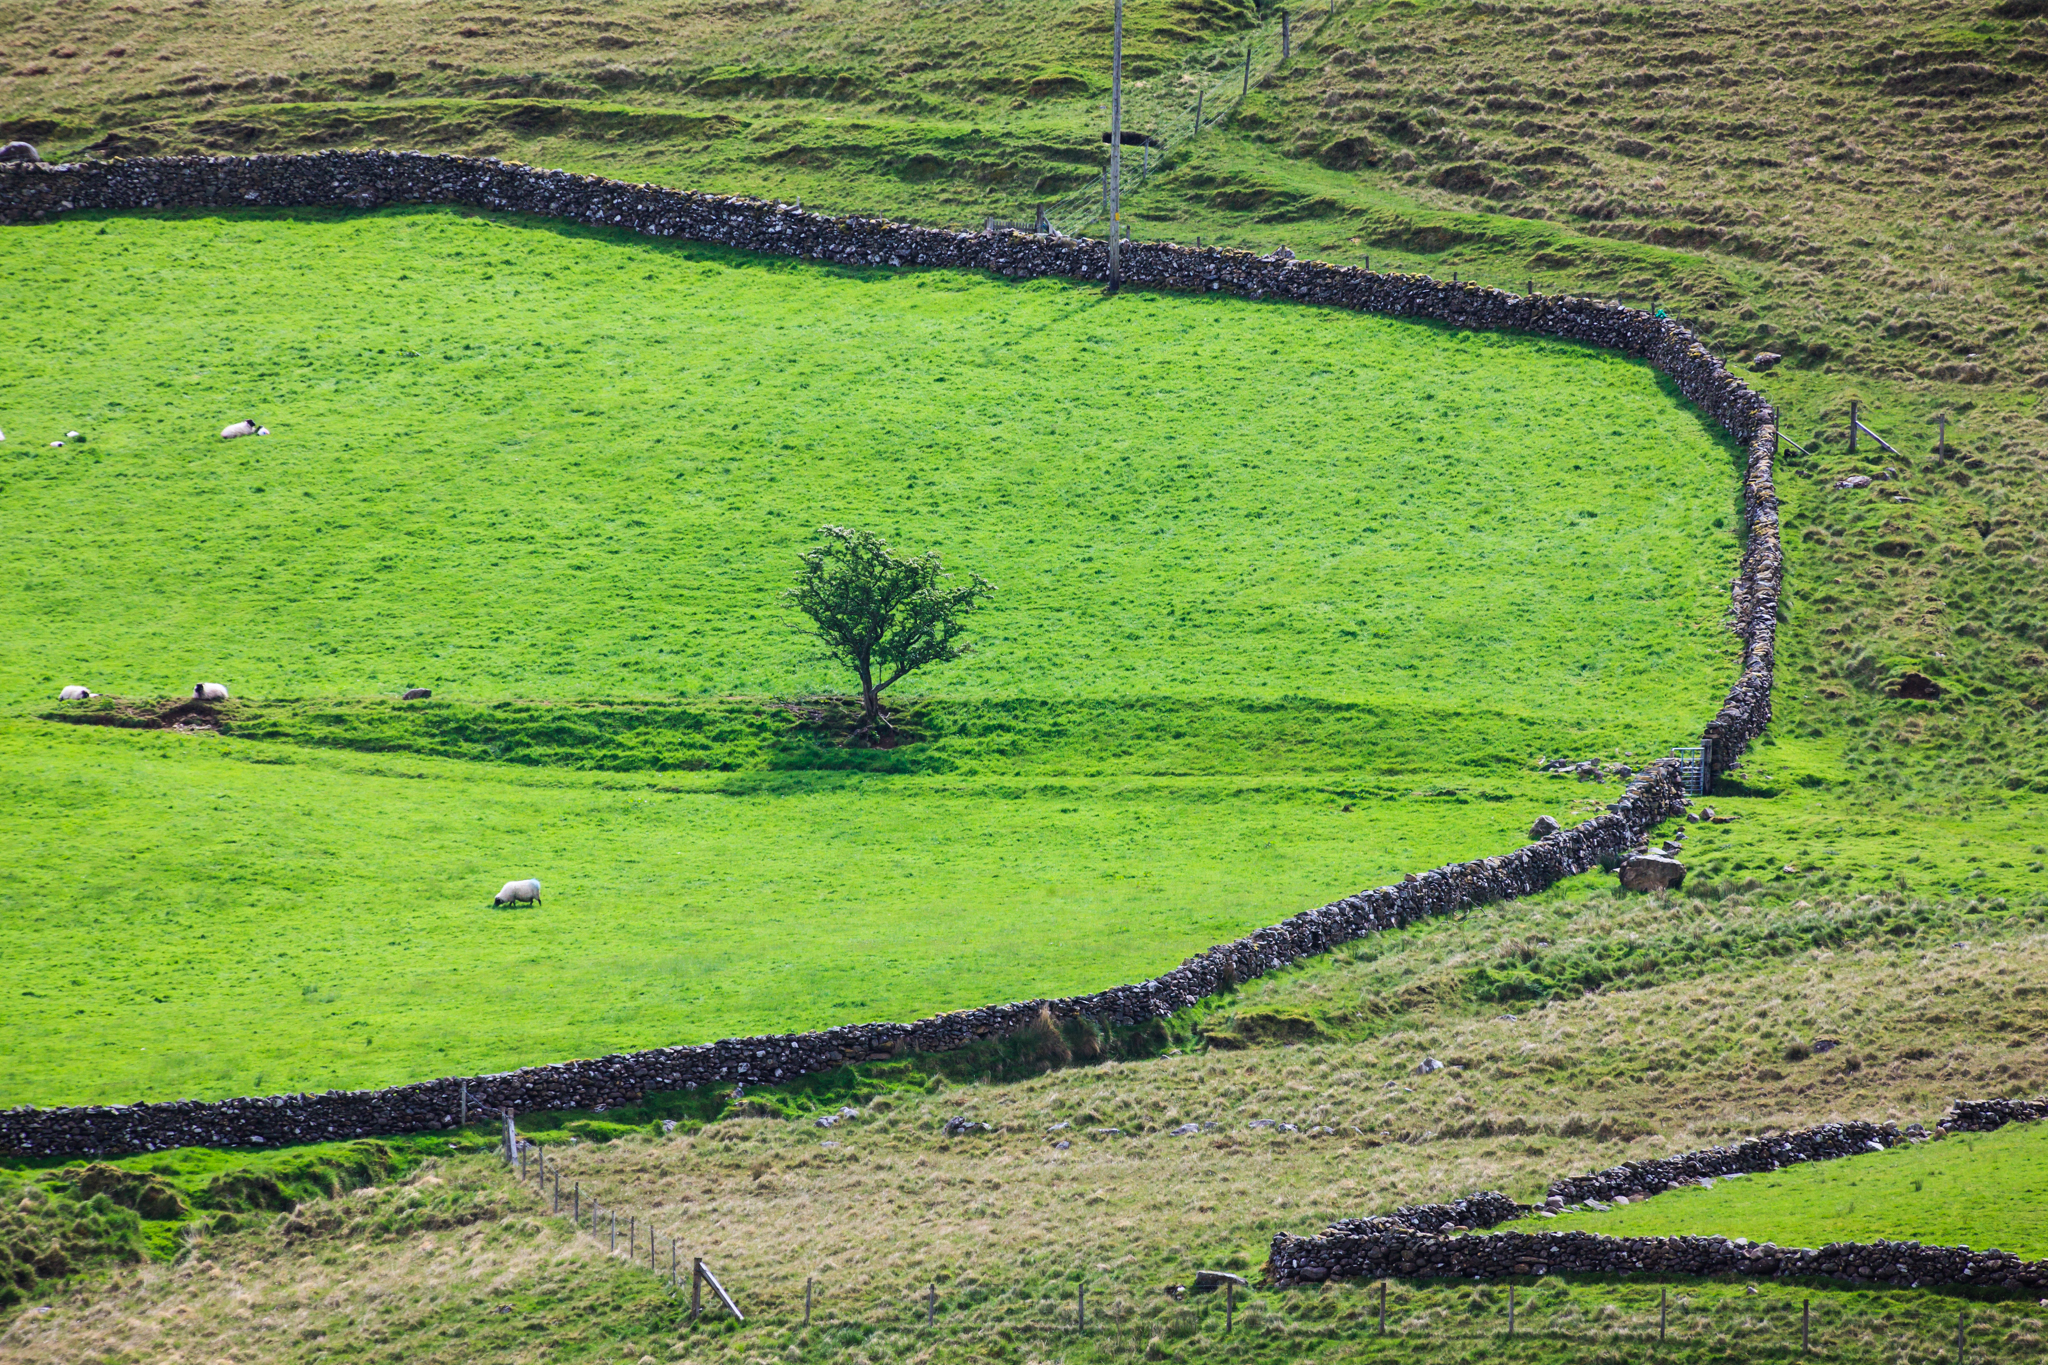 Field of Green – Ireland